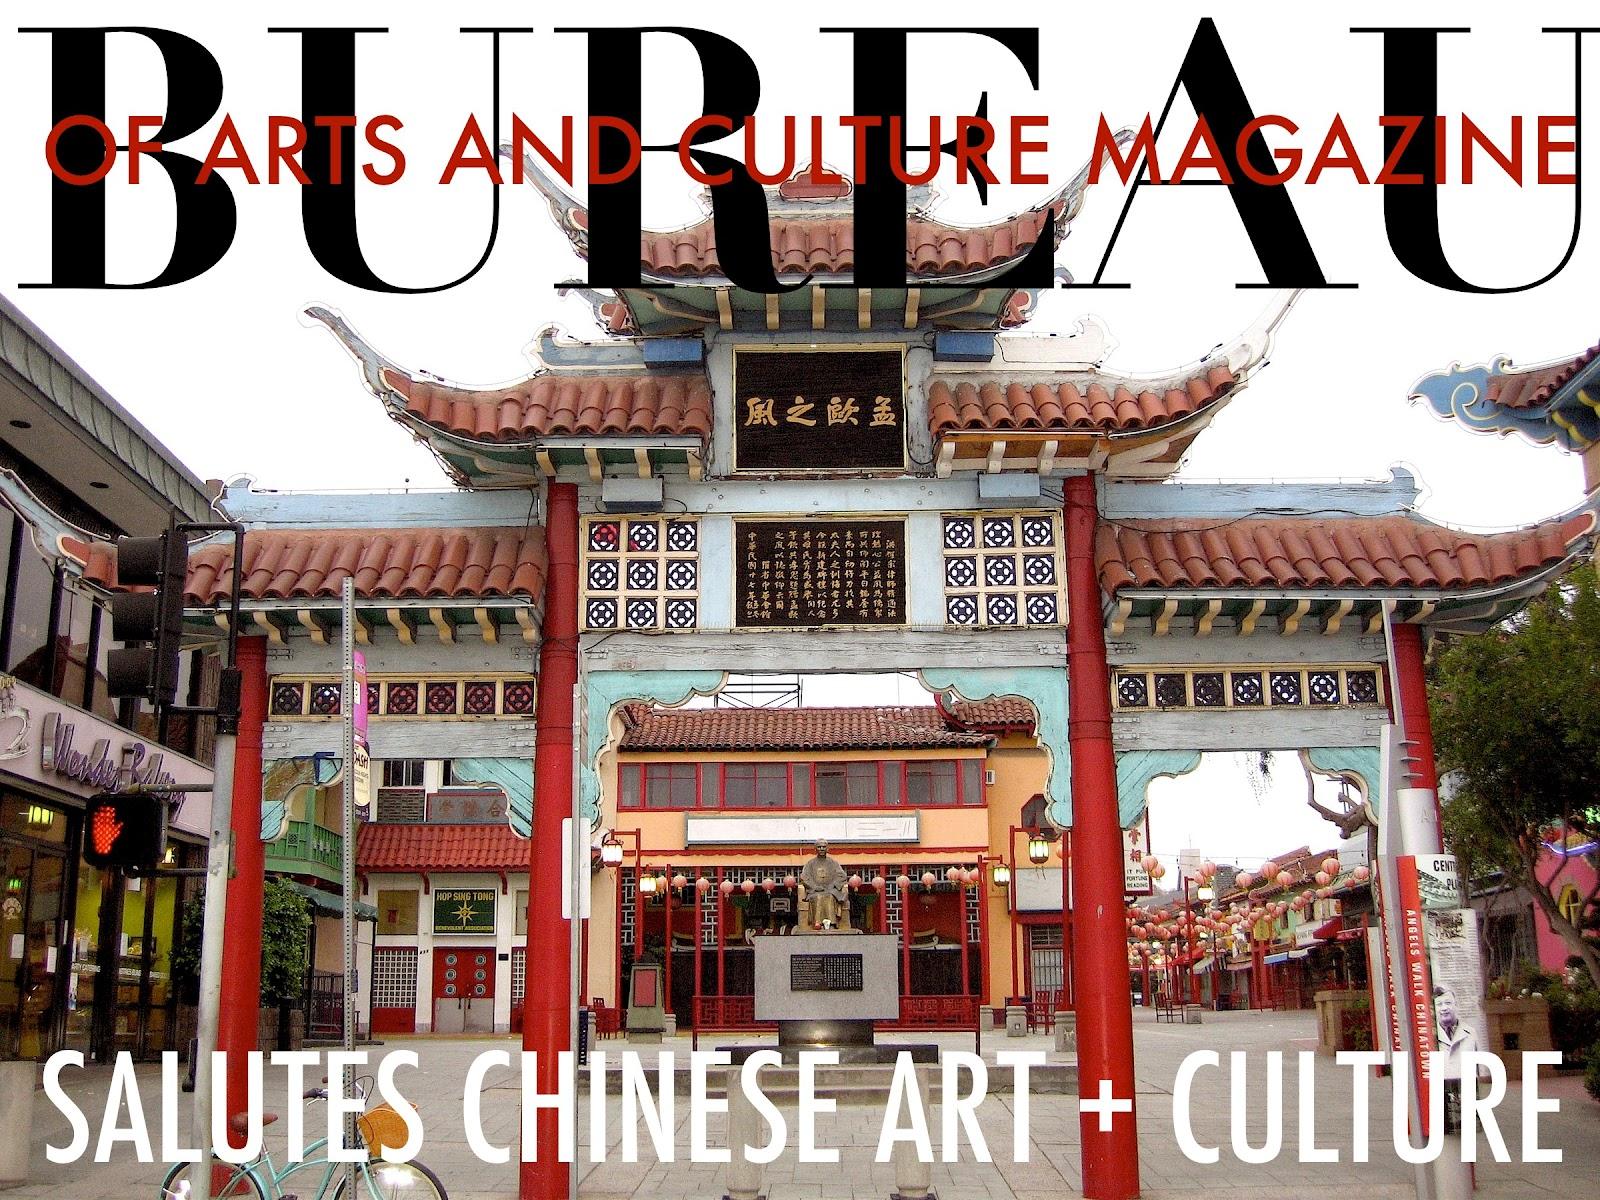 Bureau Of Arts And Culture New York Asian Edition 2015 Swan From Prison Break Diagram Origami Shrine